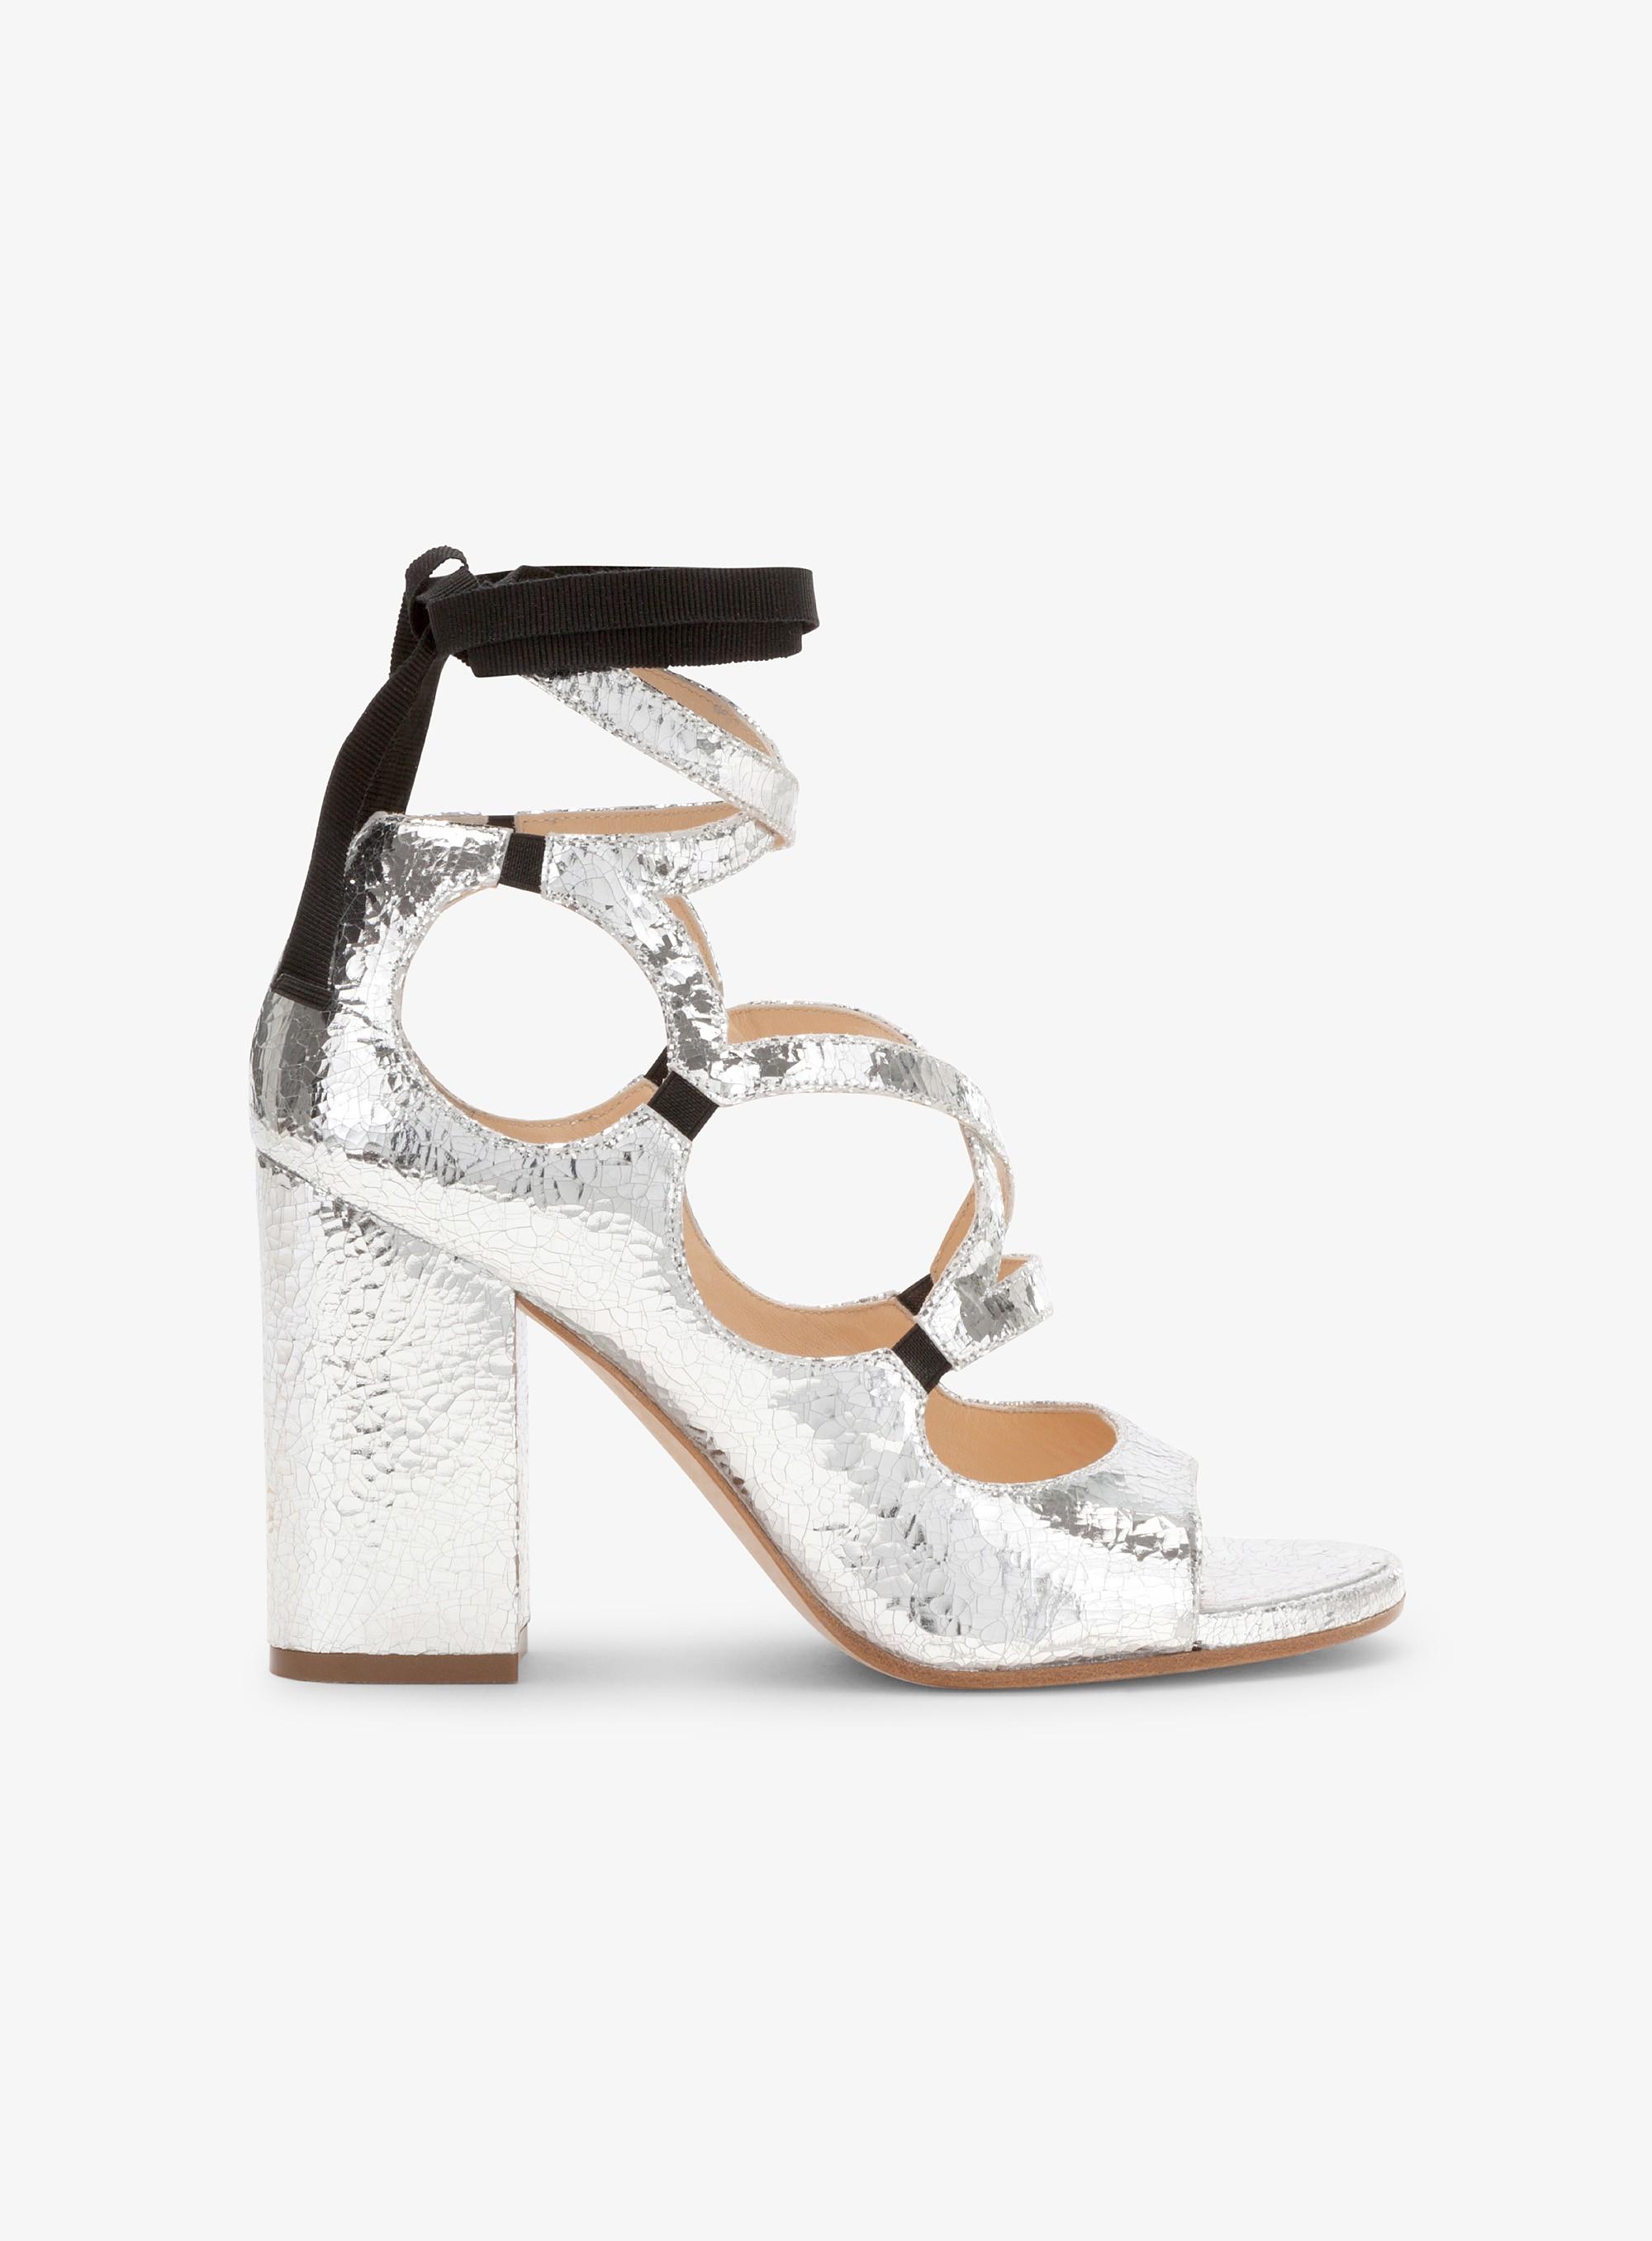 Sandal model Boa Vista Silver Ballin brand